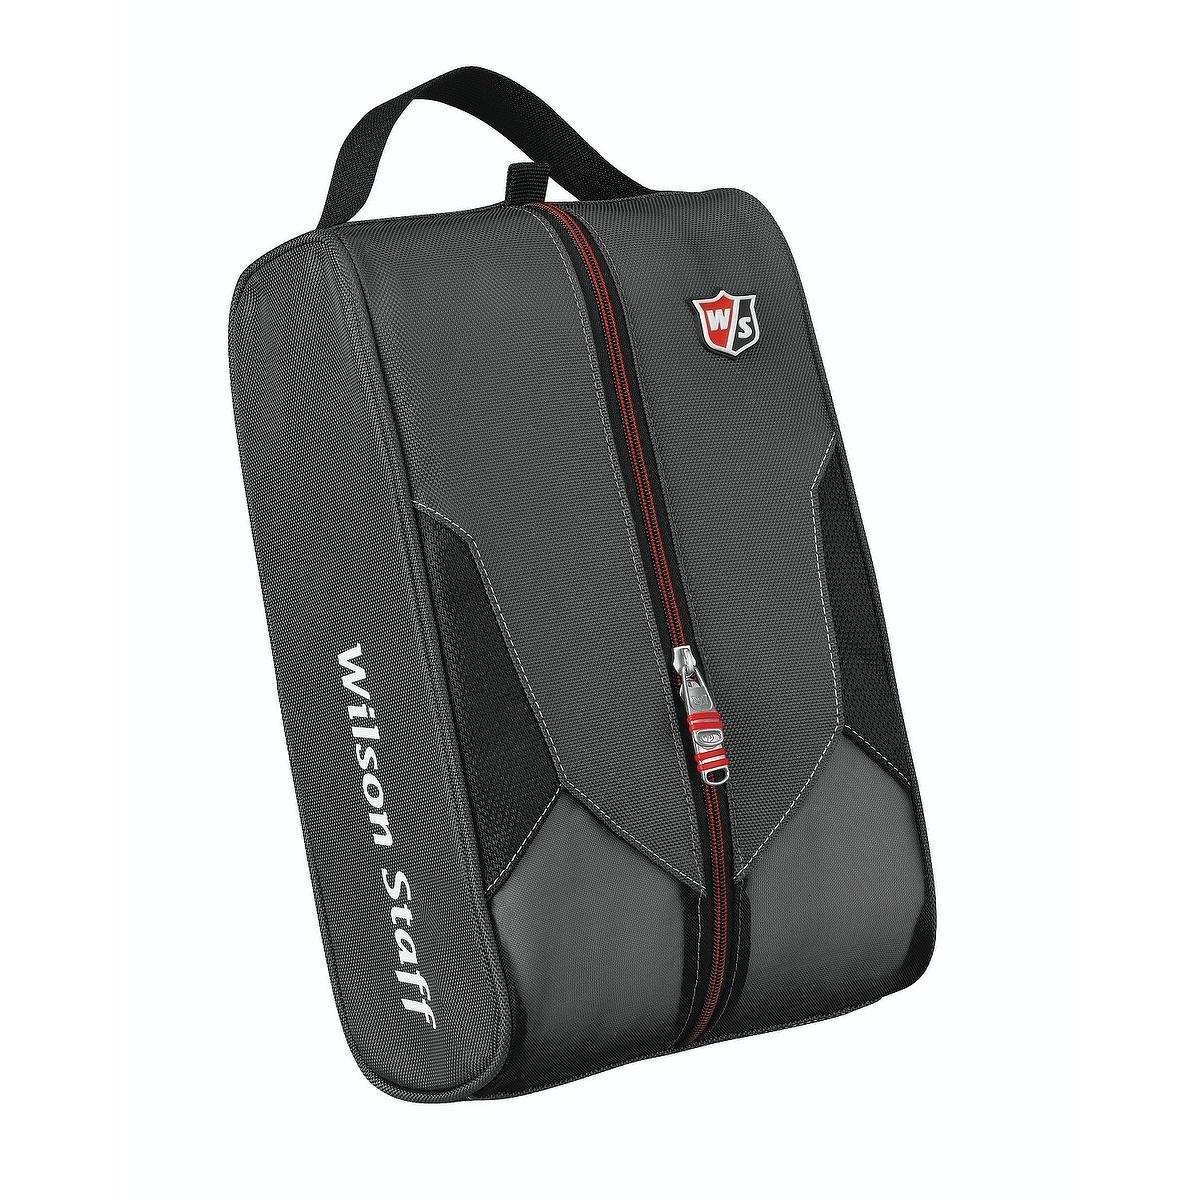 Wilson Staff Golf Travel Bag